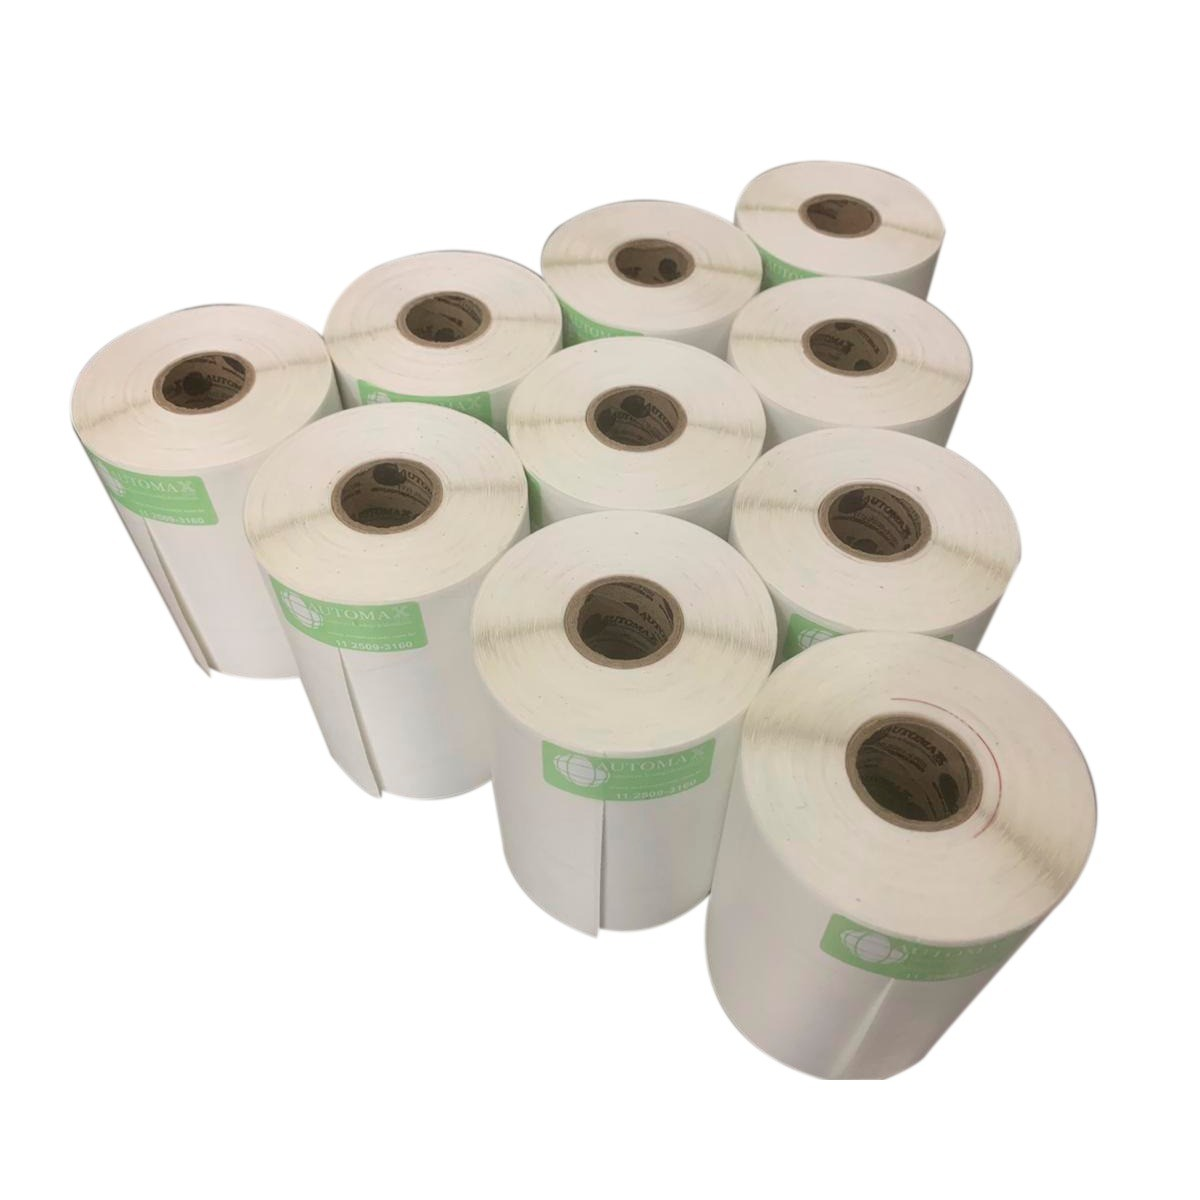 10 Rolos de Etiqueta BOPP 10x8cm | 100mmX80mm